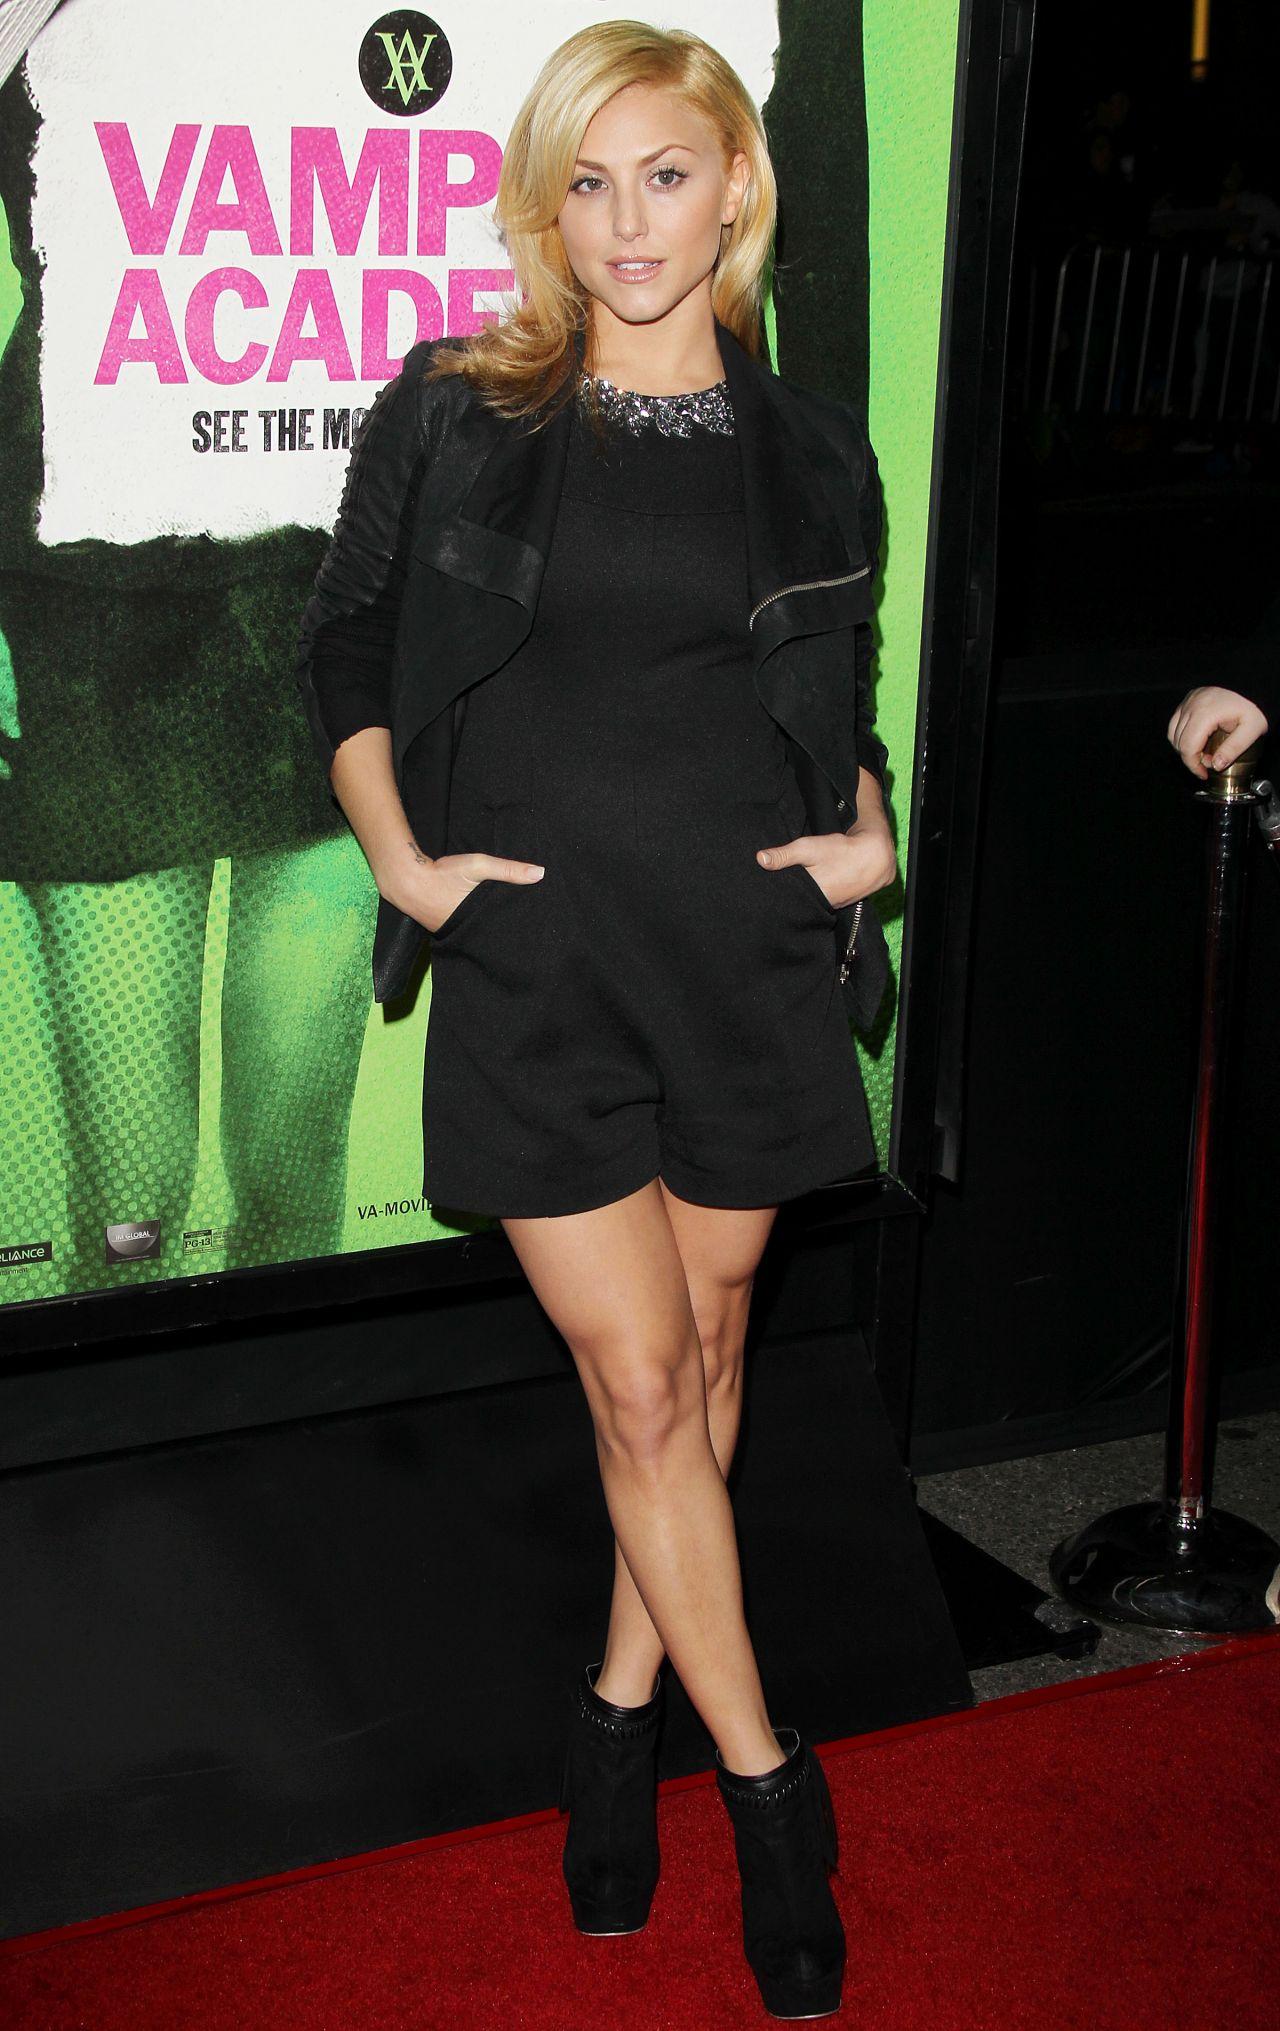 VAMPIRE ACADEMY Premiere in Los Angeles - Cassie Scerbo